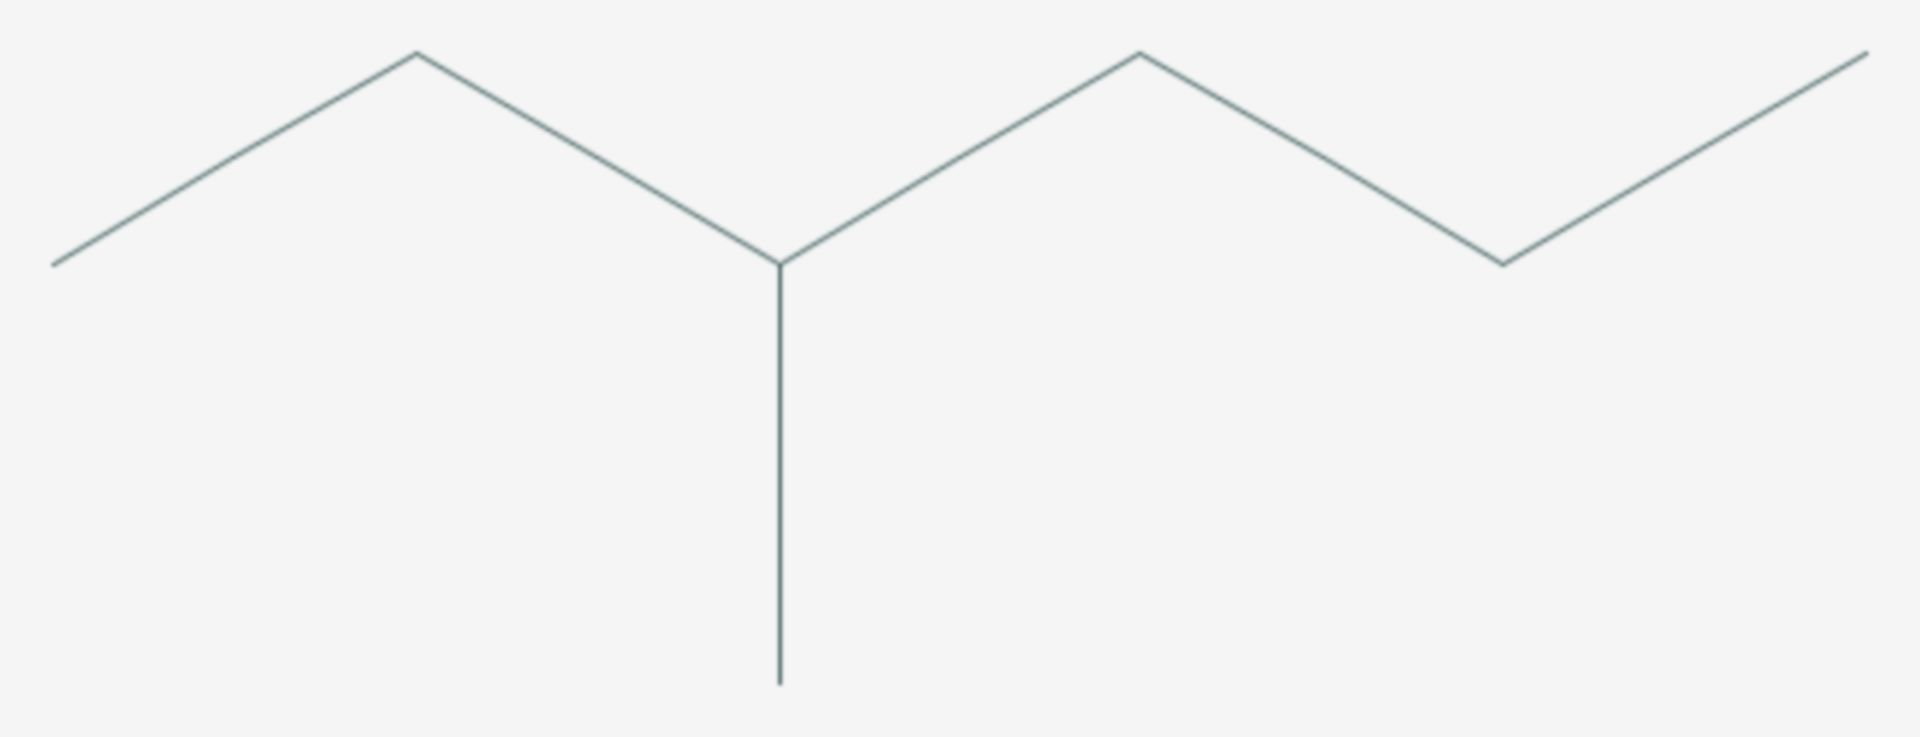 3-Methylhexan (Strukturformel)